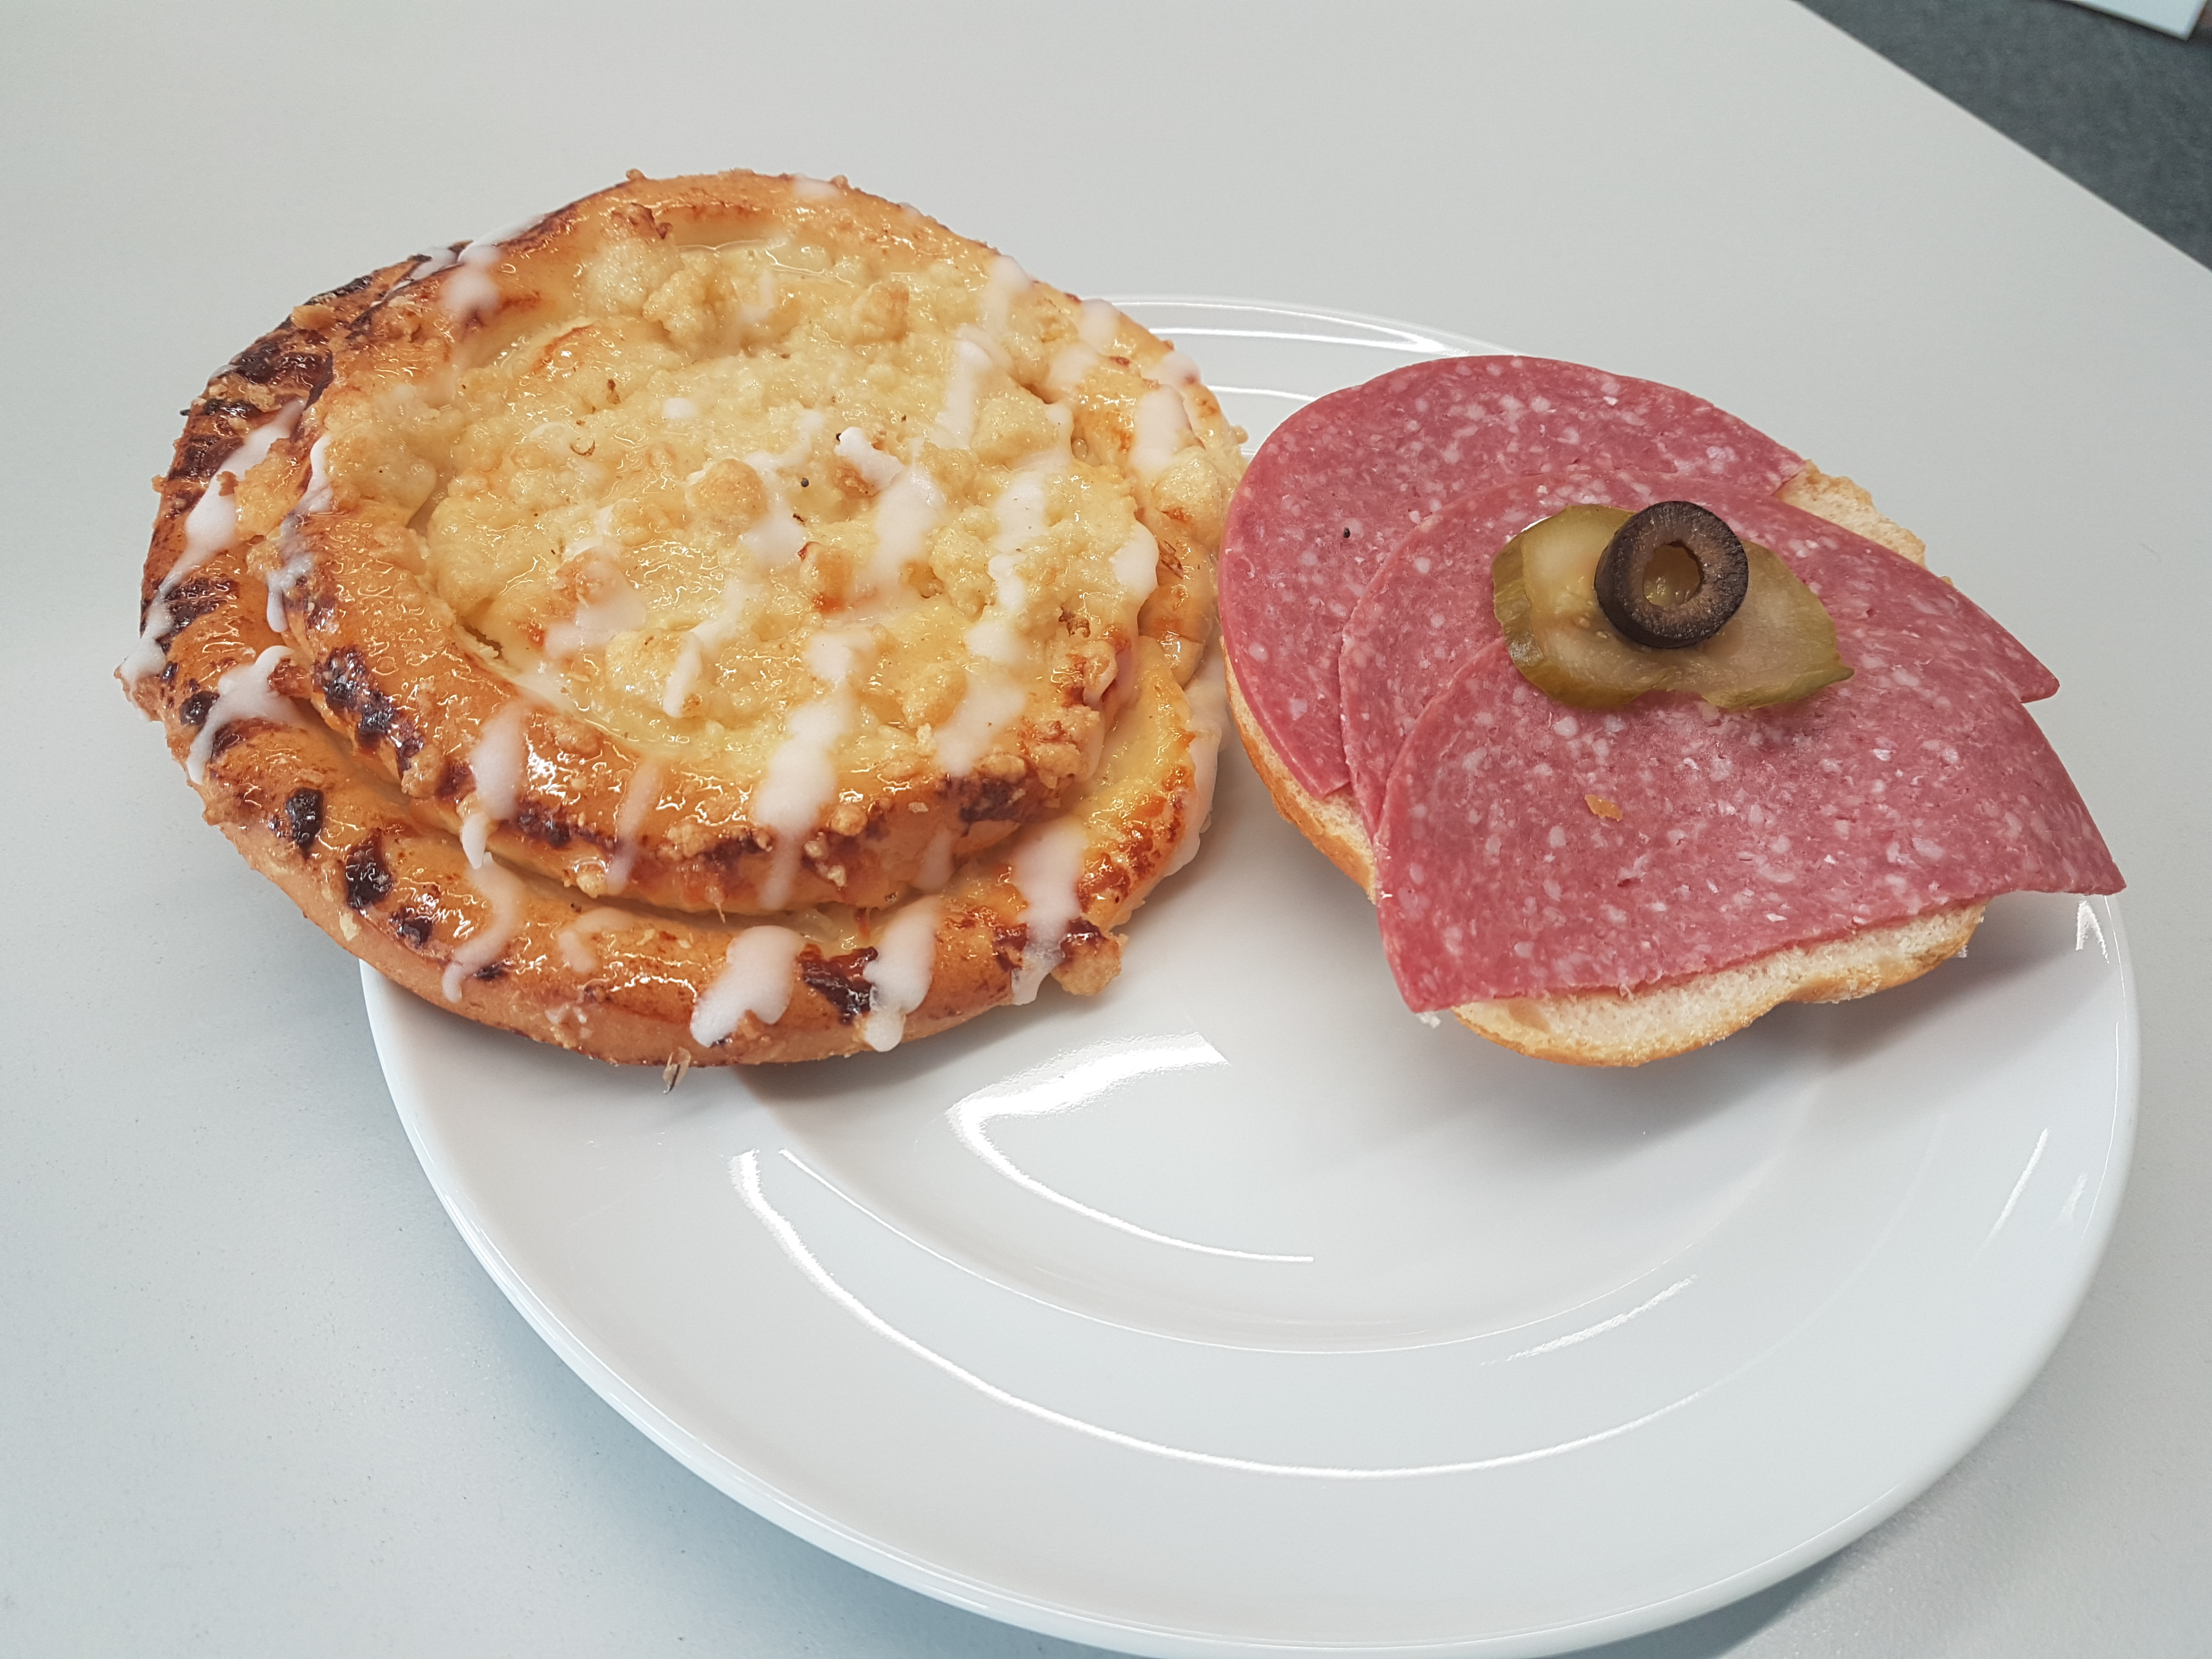 http://foodloader.net/Holz_2018-11-05_Snacks.jpg